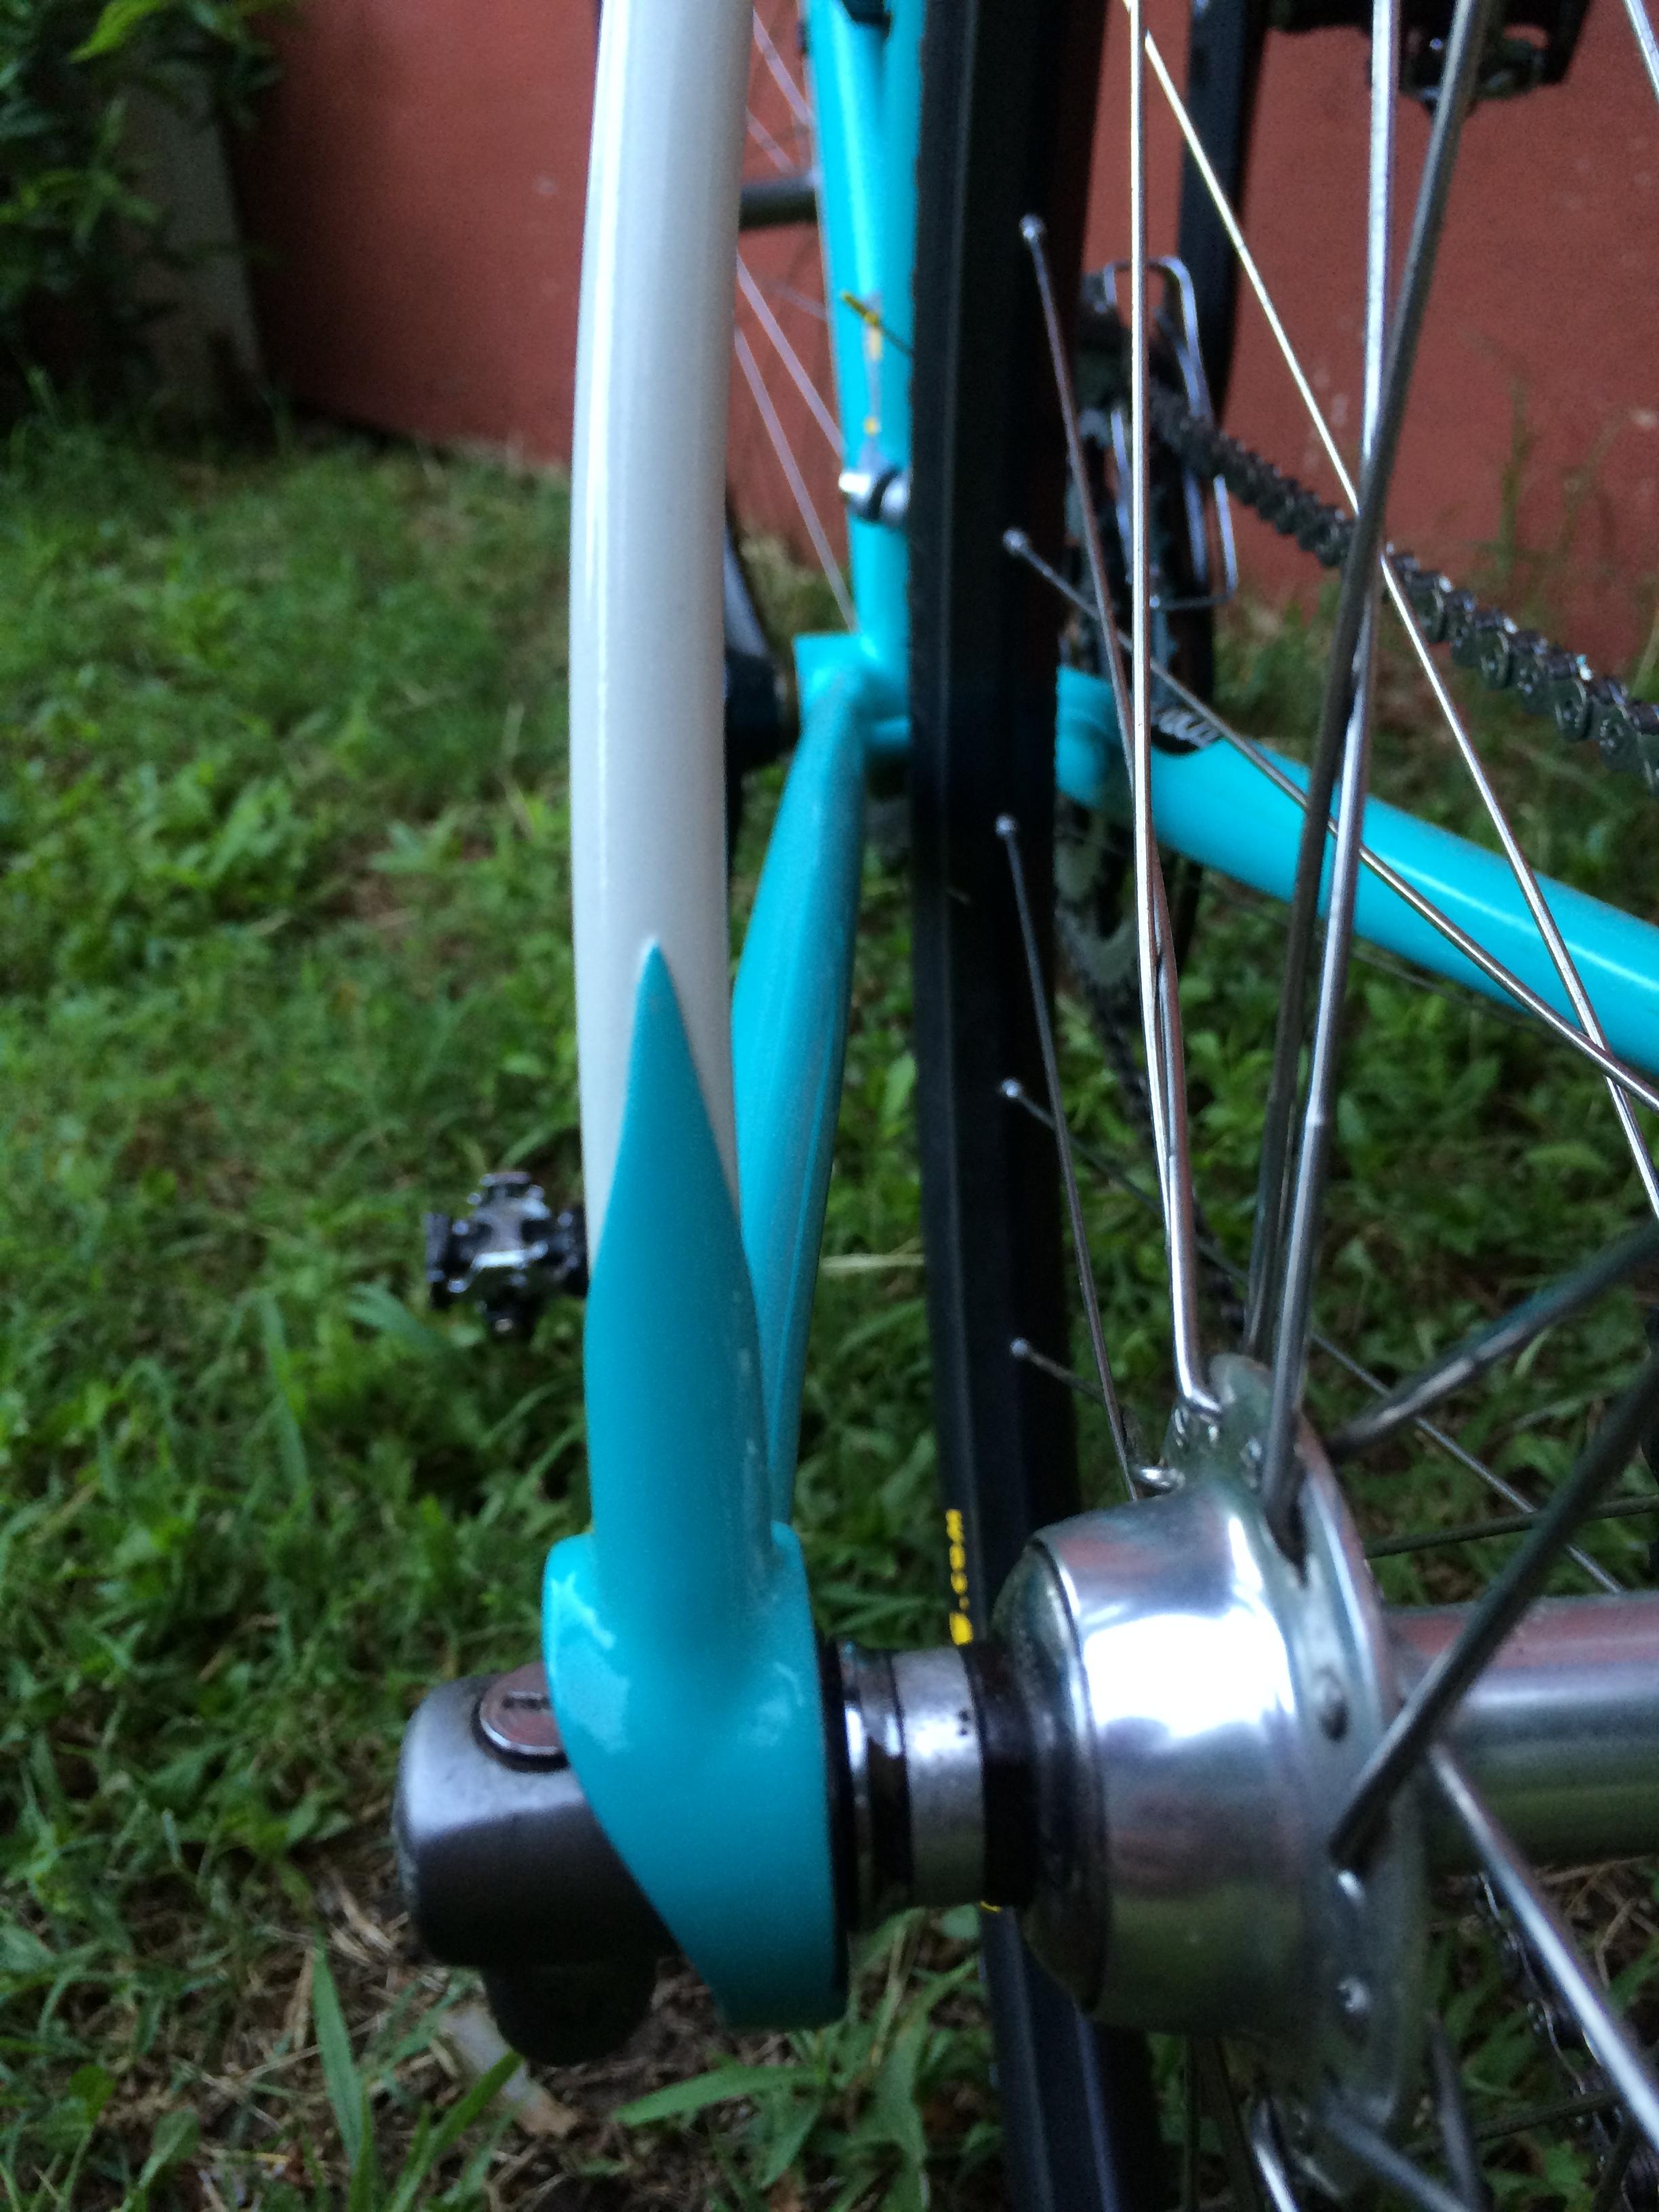 Dogwood-cycleworx-steel-custom-bicycle-columbus-tubing-cyclo-cross-15.jpg